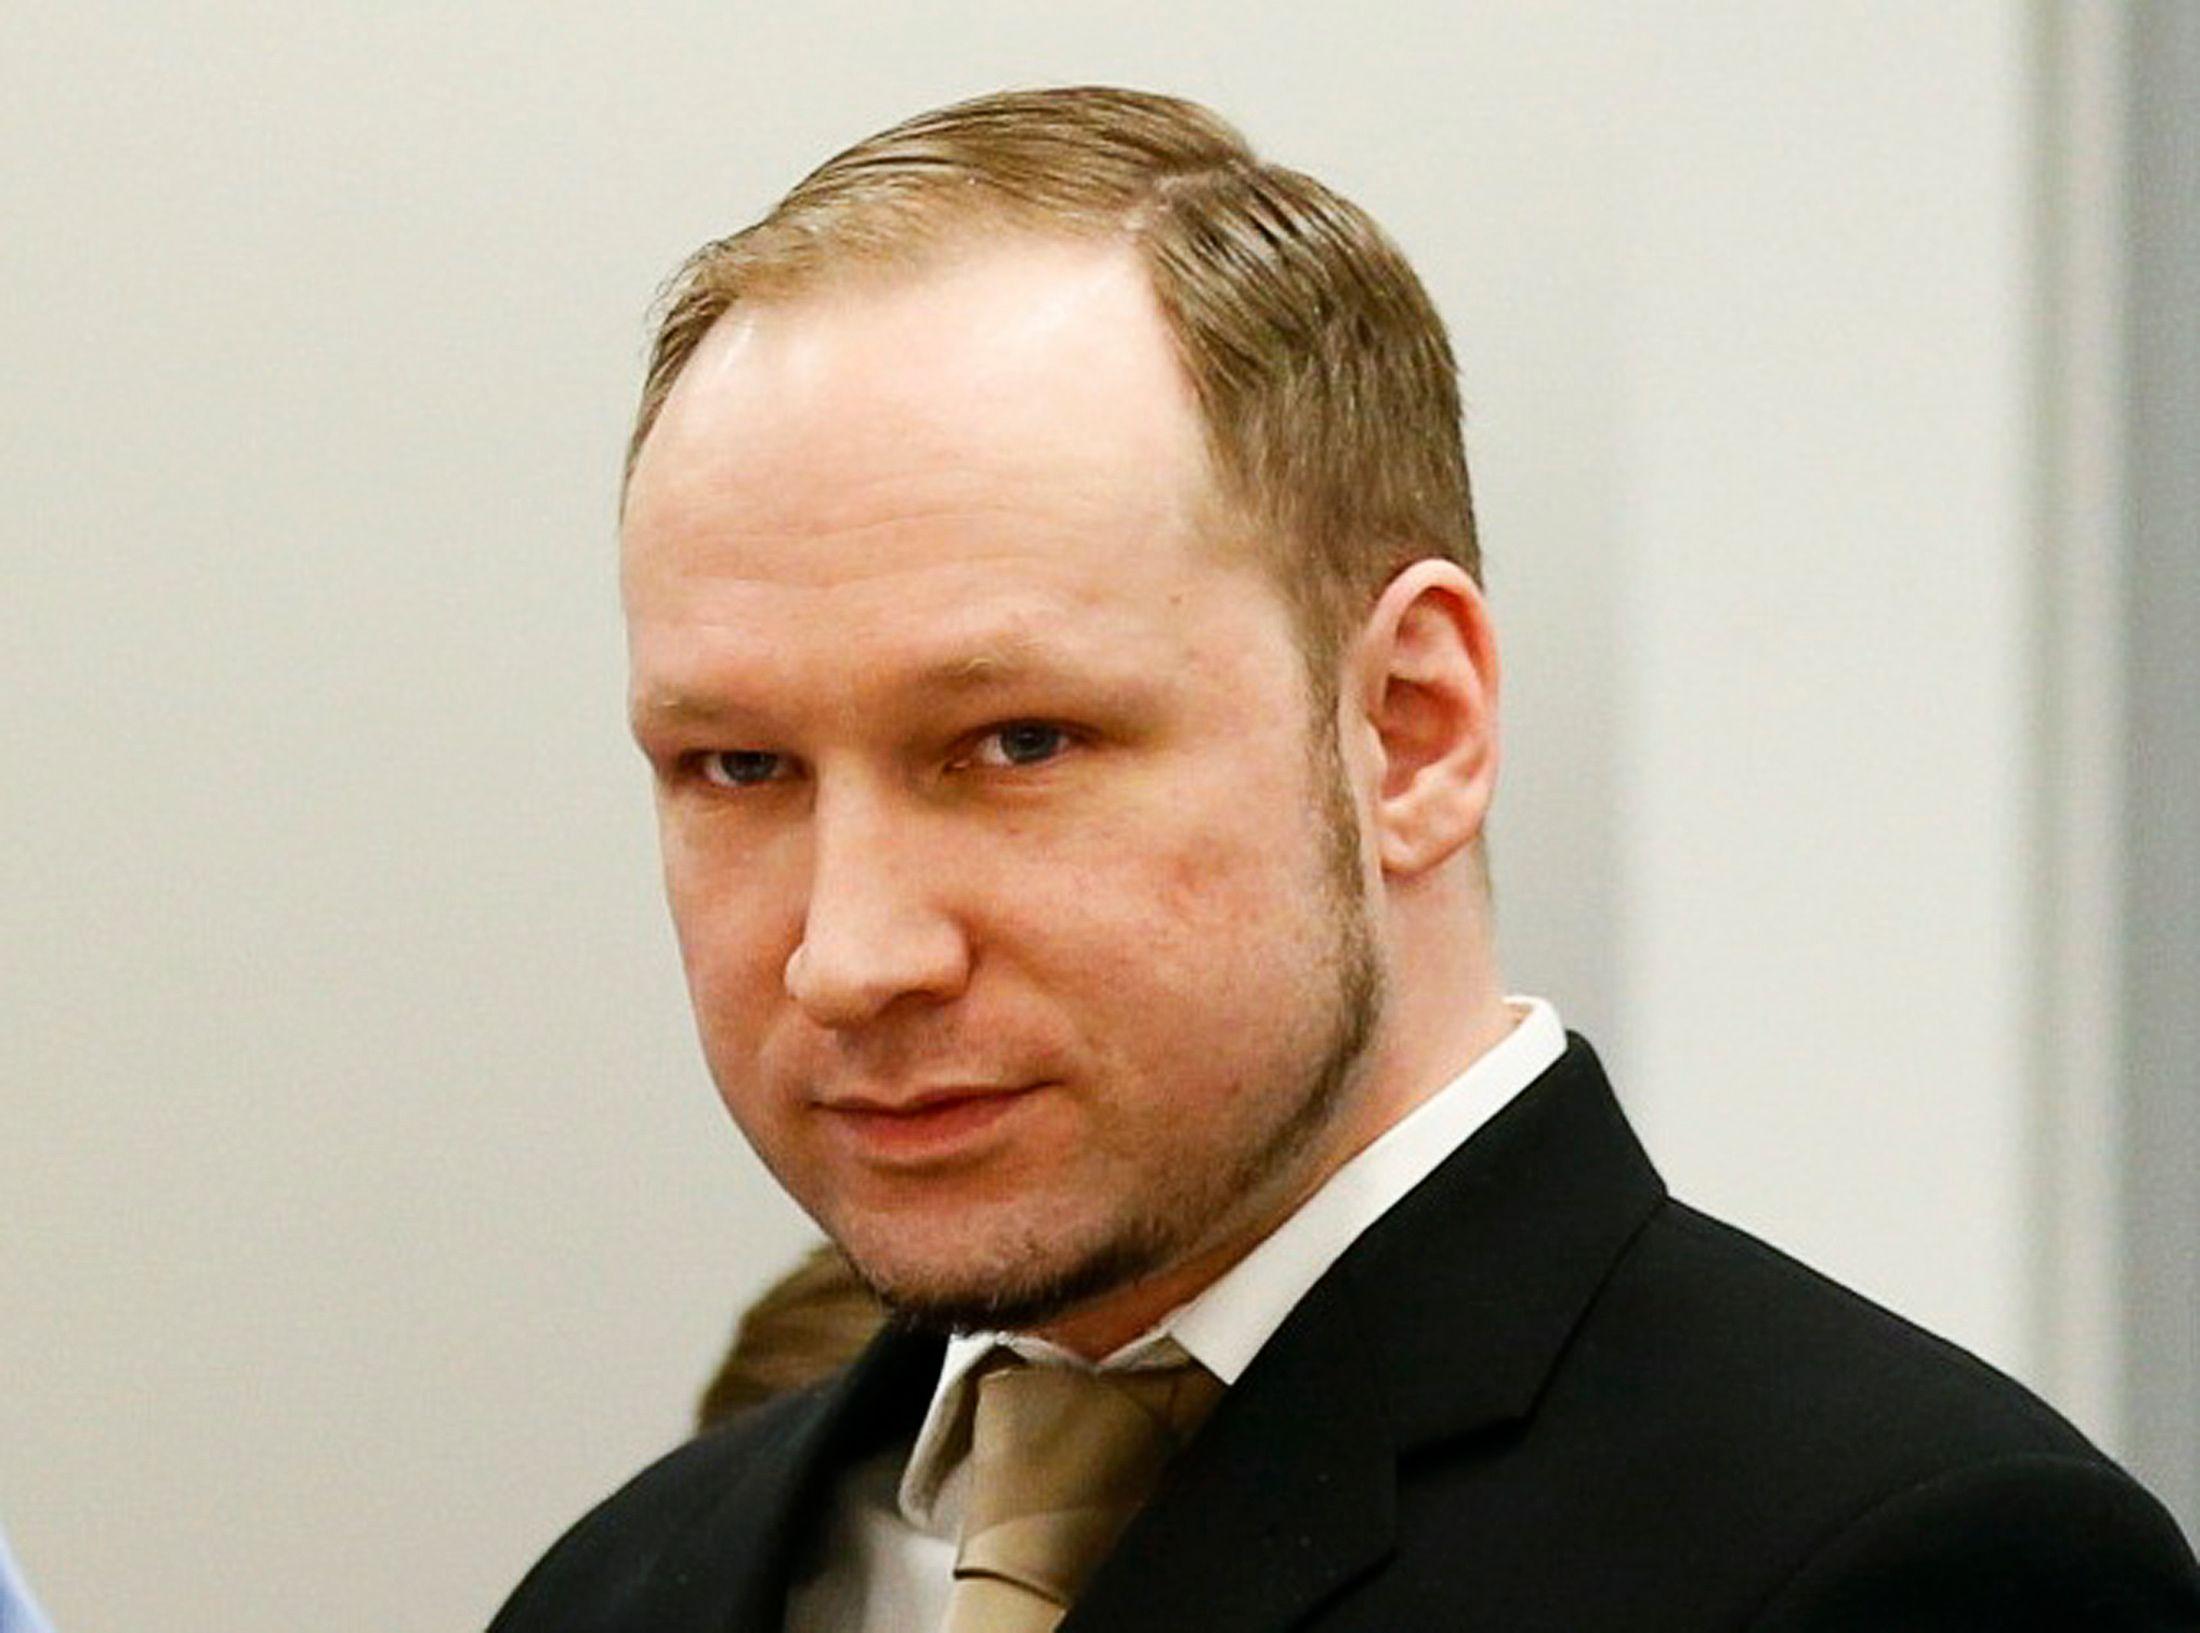 Quels étaients les objectifs de Anders Behring Breivik ?